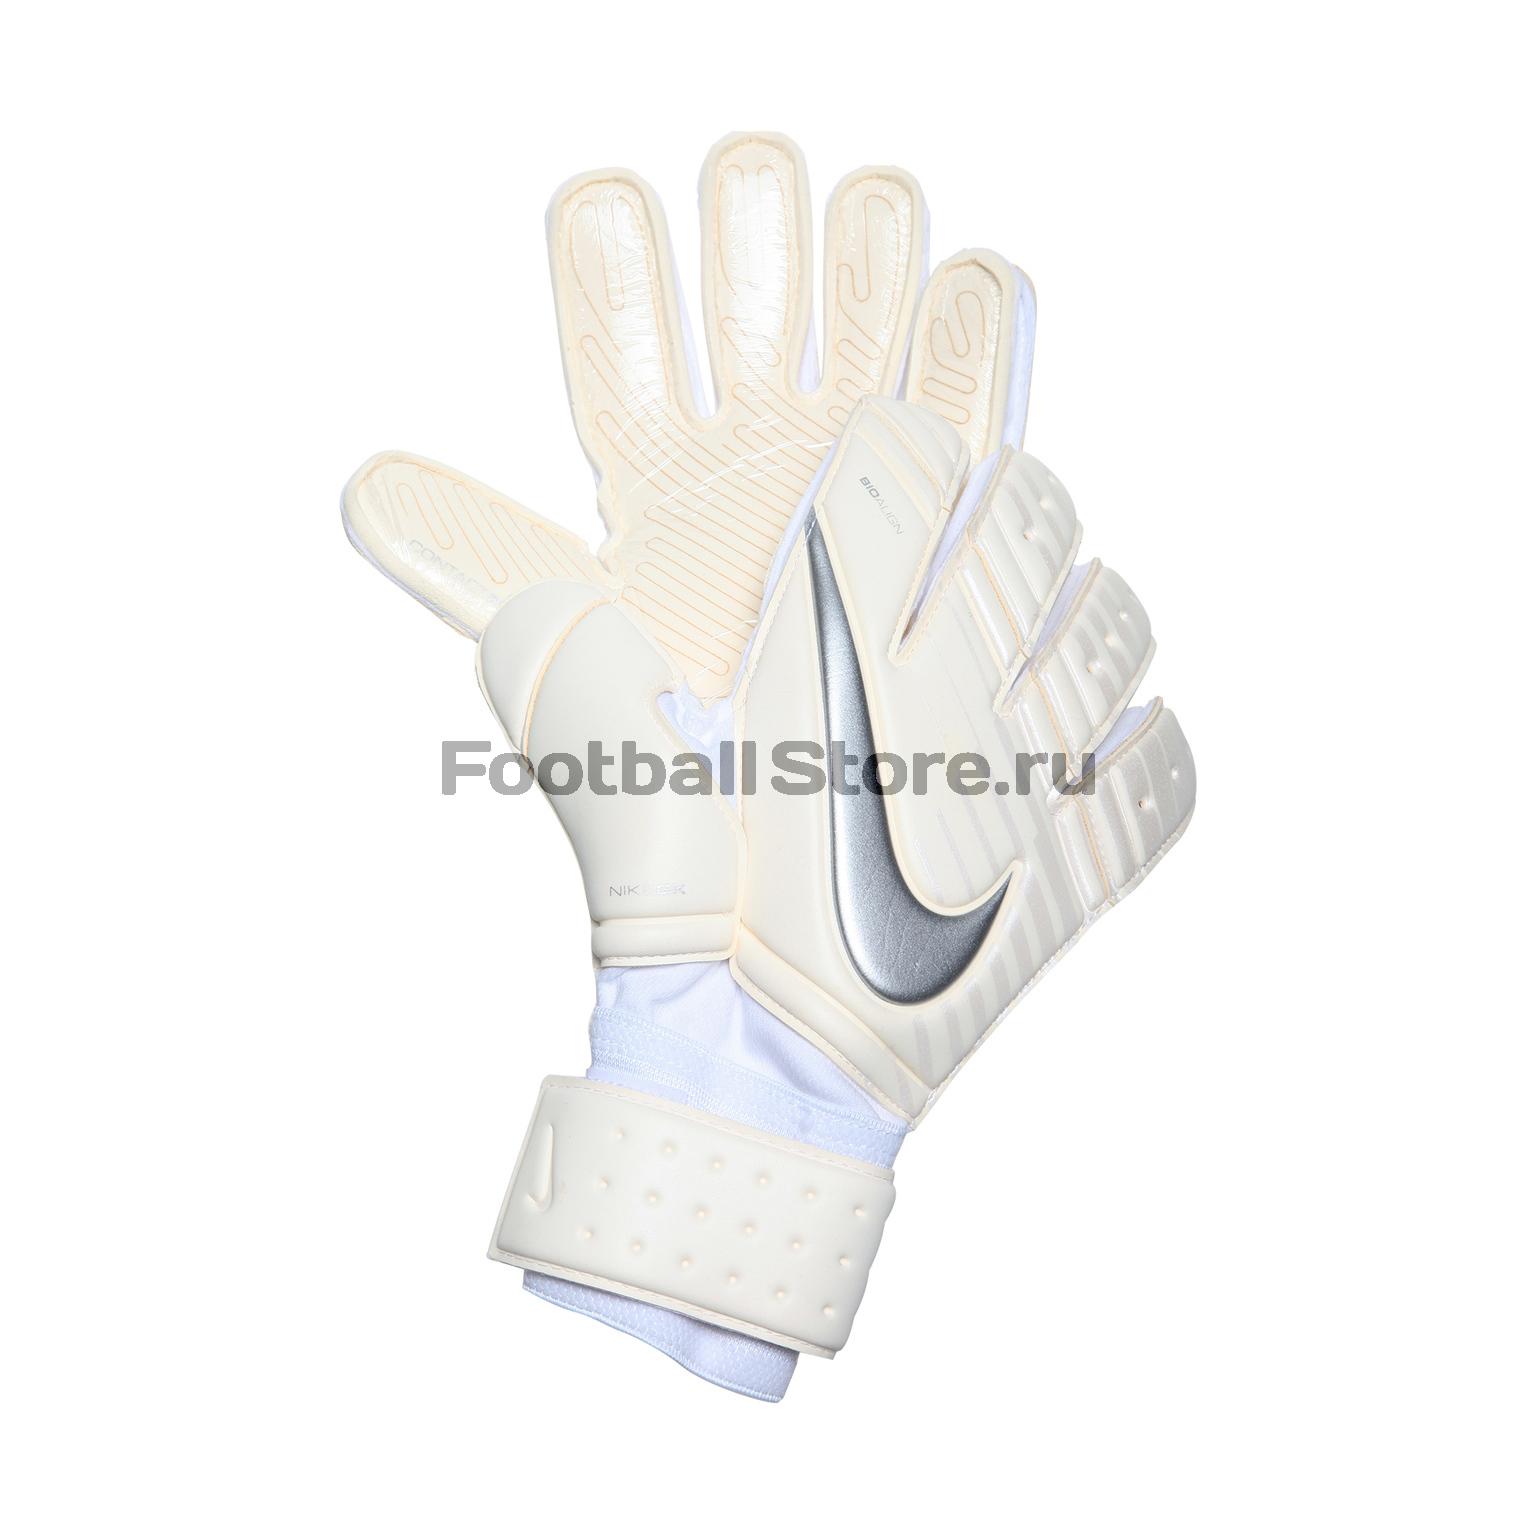 Перчатки вратарские Nike GK PRMR SGT GS0345-100 классические nike мяч nike nk prmr team fifa sc2971 100